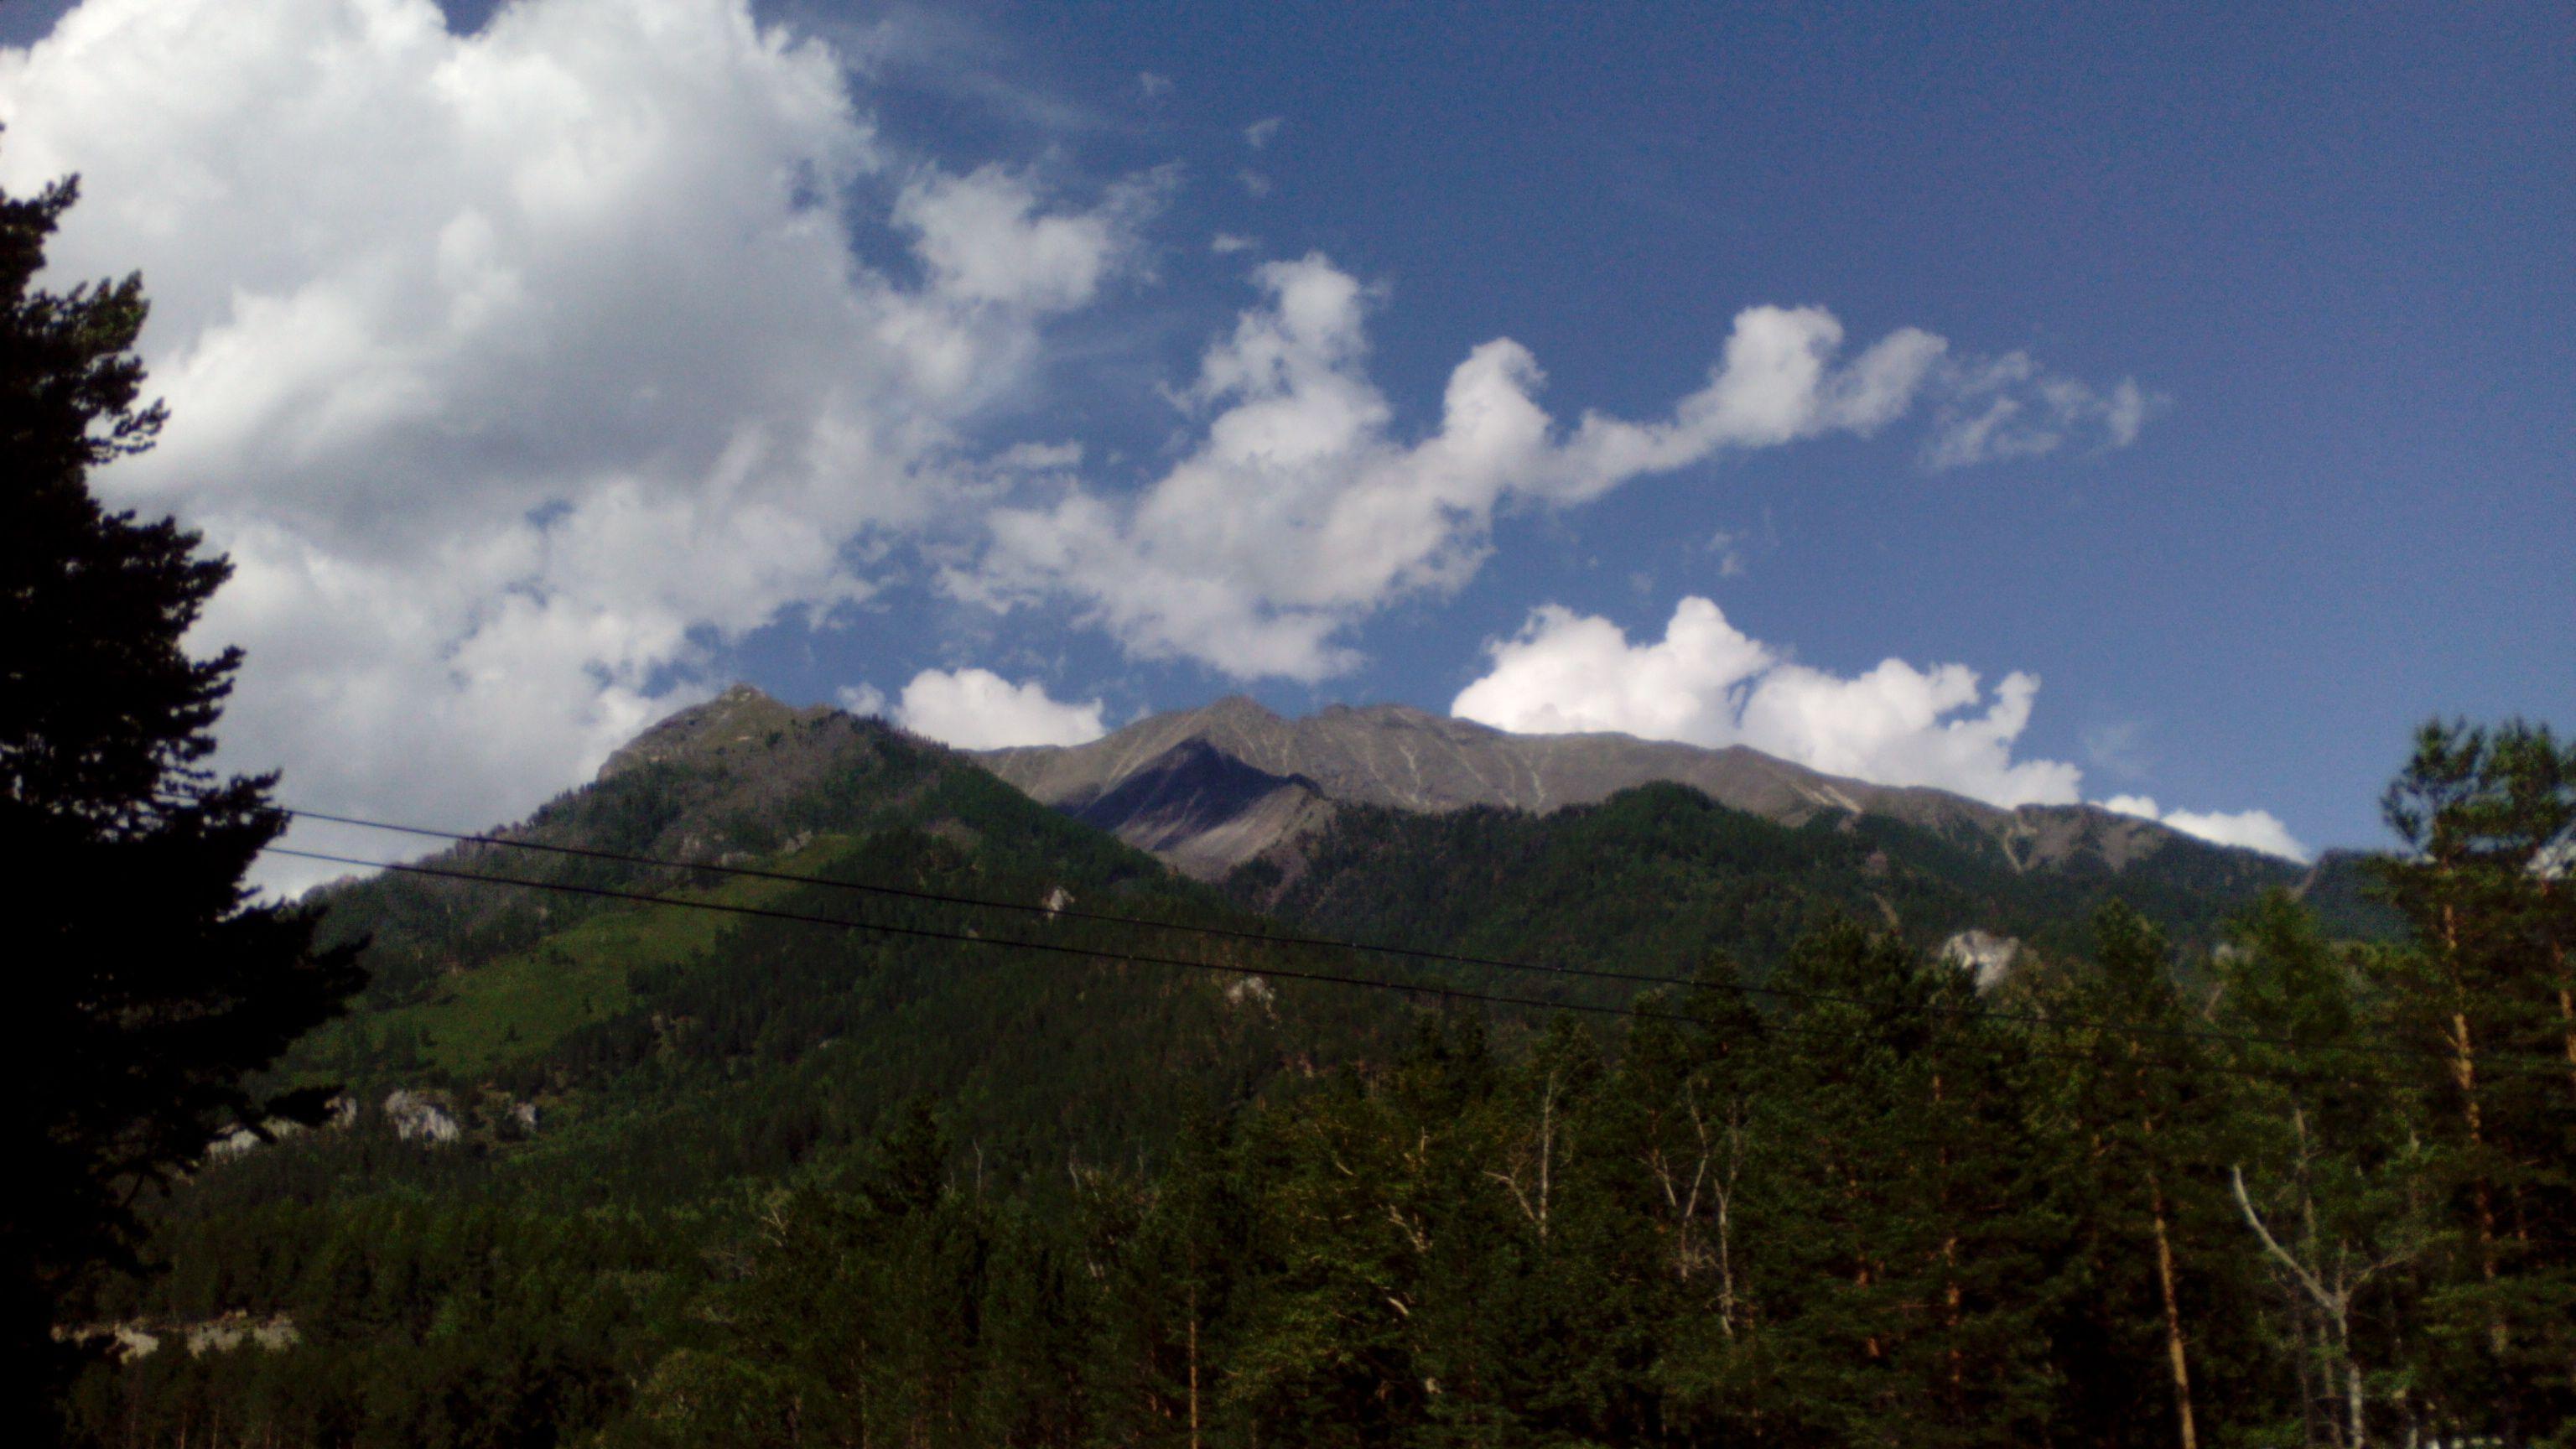 Вид на горы в Аршане. Фото из архива блога shveda.ru